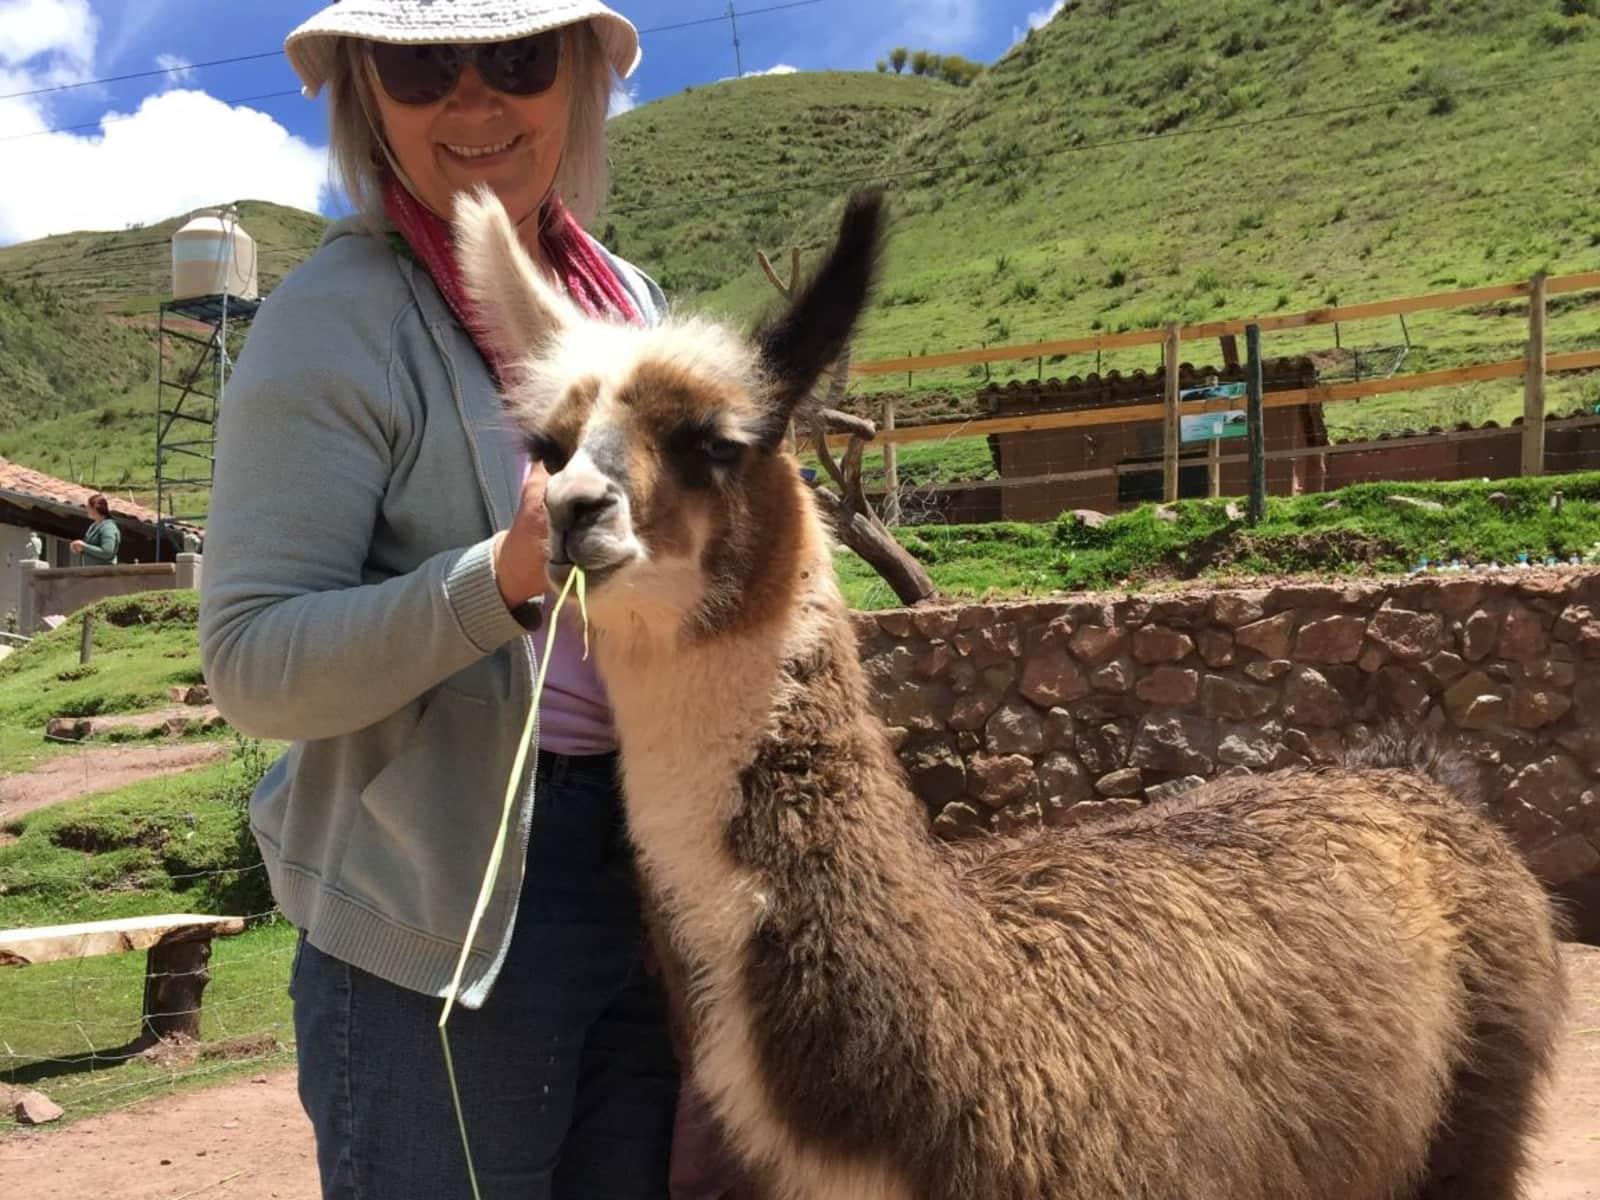 Linda from Albuquerque, New Mexico, United States